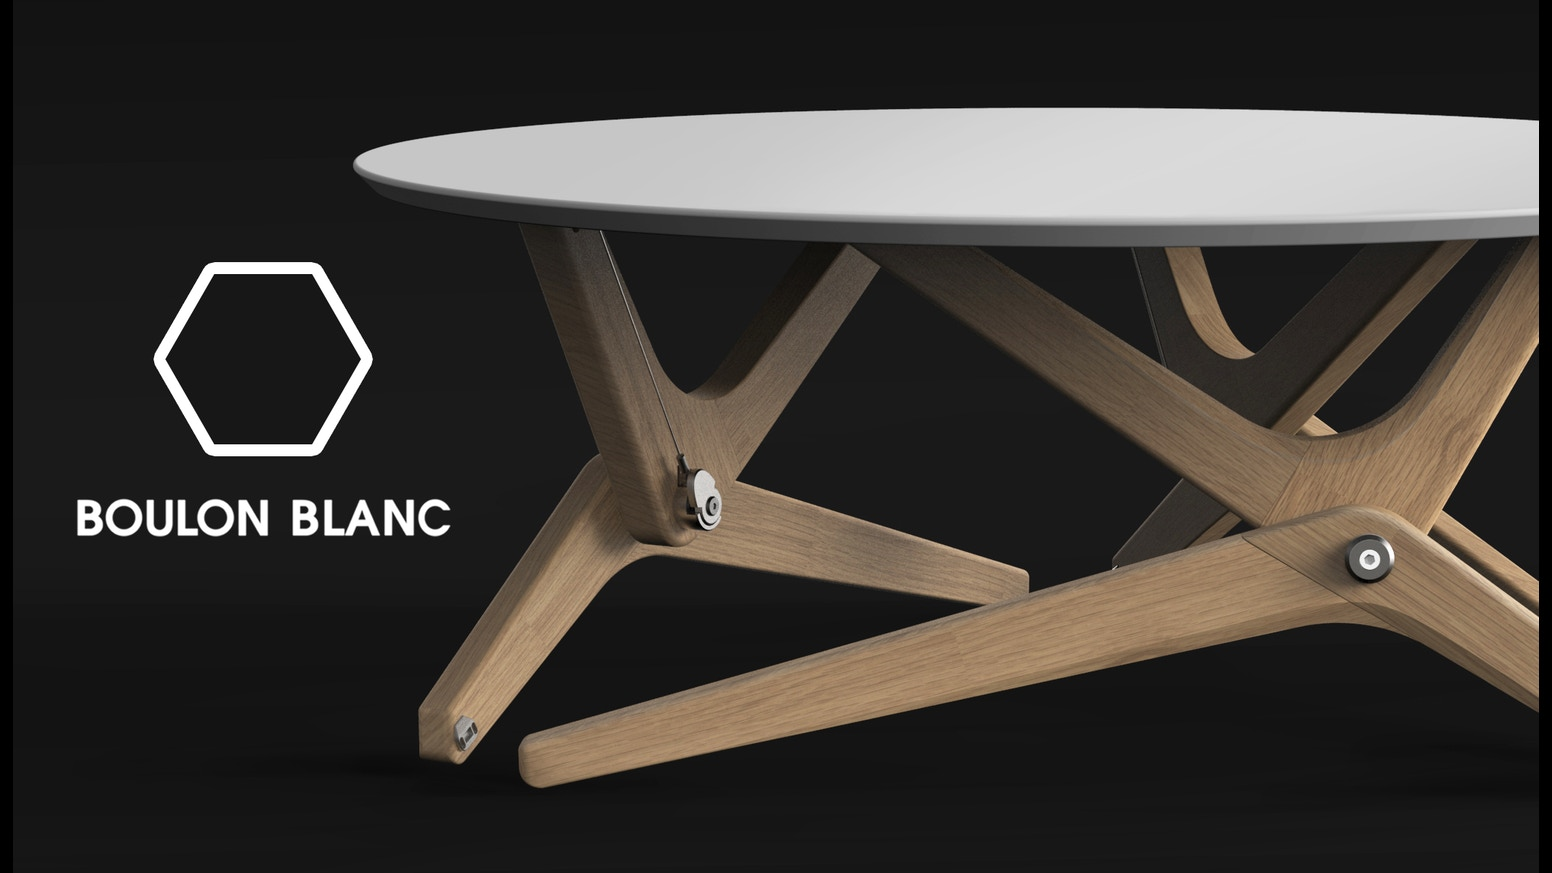 Boulon Blanc The Next Generation Of Transformable Tables By Boulon Blanc Kickstarter